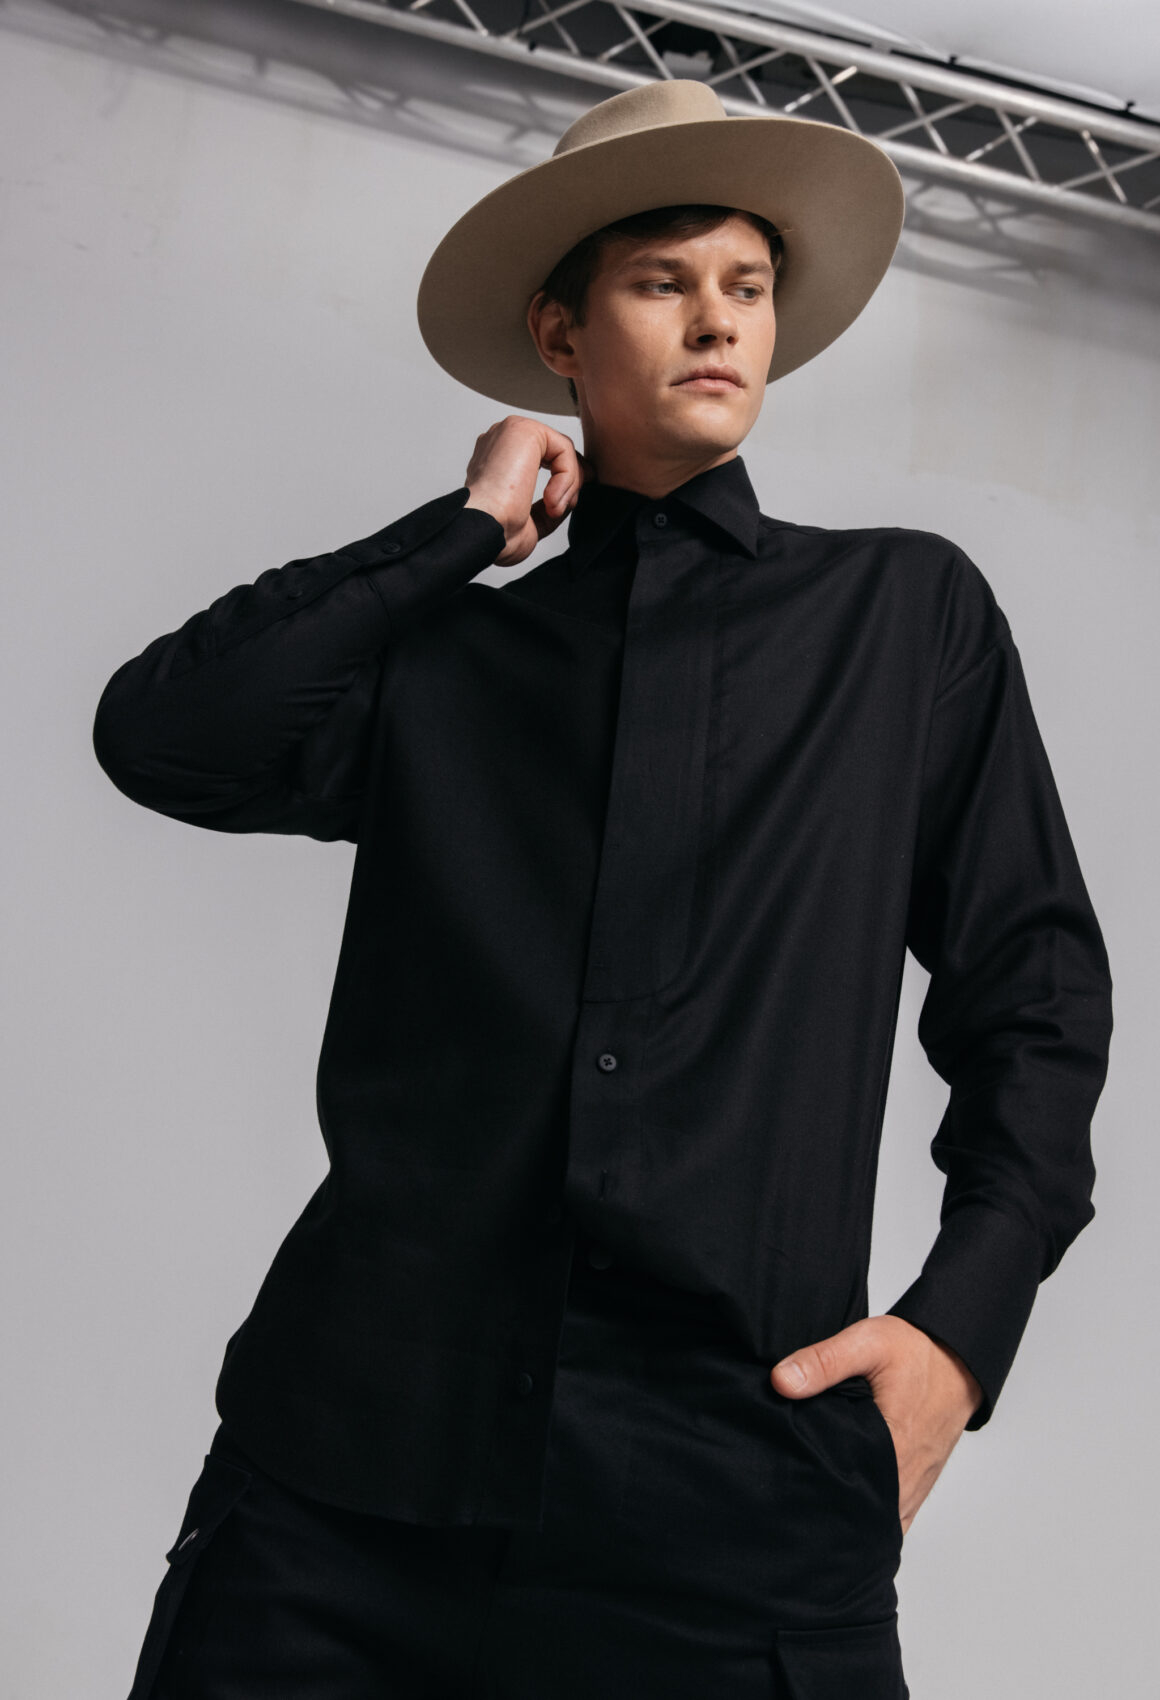 Black Hvelfing shirt